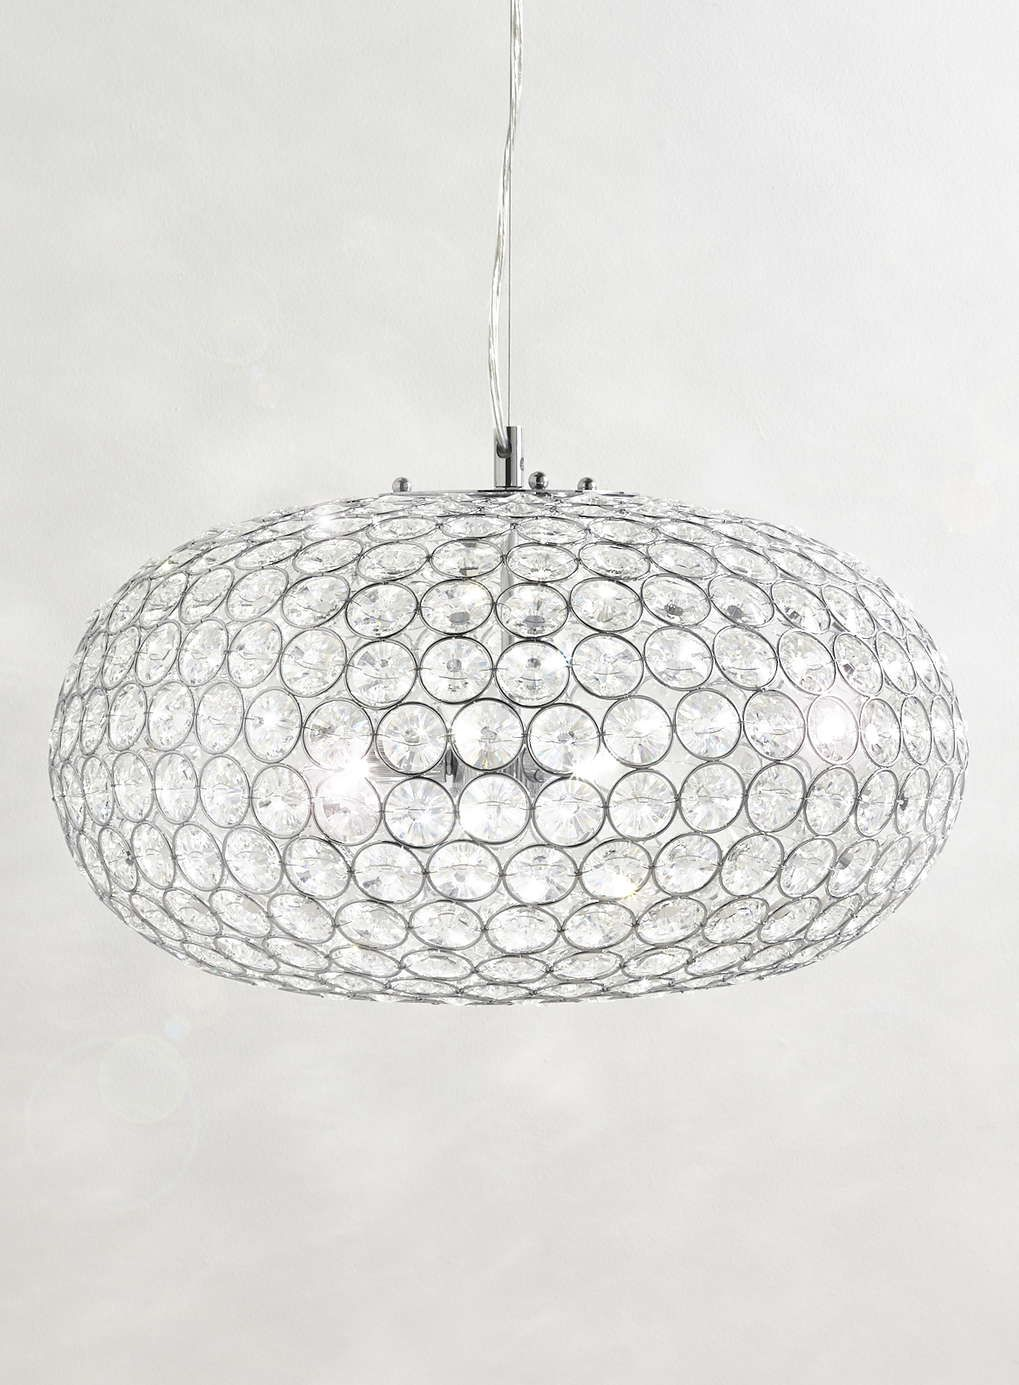 Merle chandelier pendant bhs bedroom pinterest chandeliers photo 2 of merle chandelier pendant aloadofball Choice Image